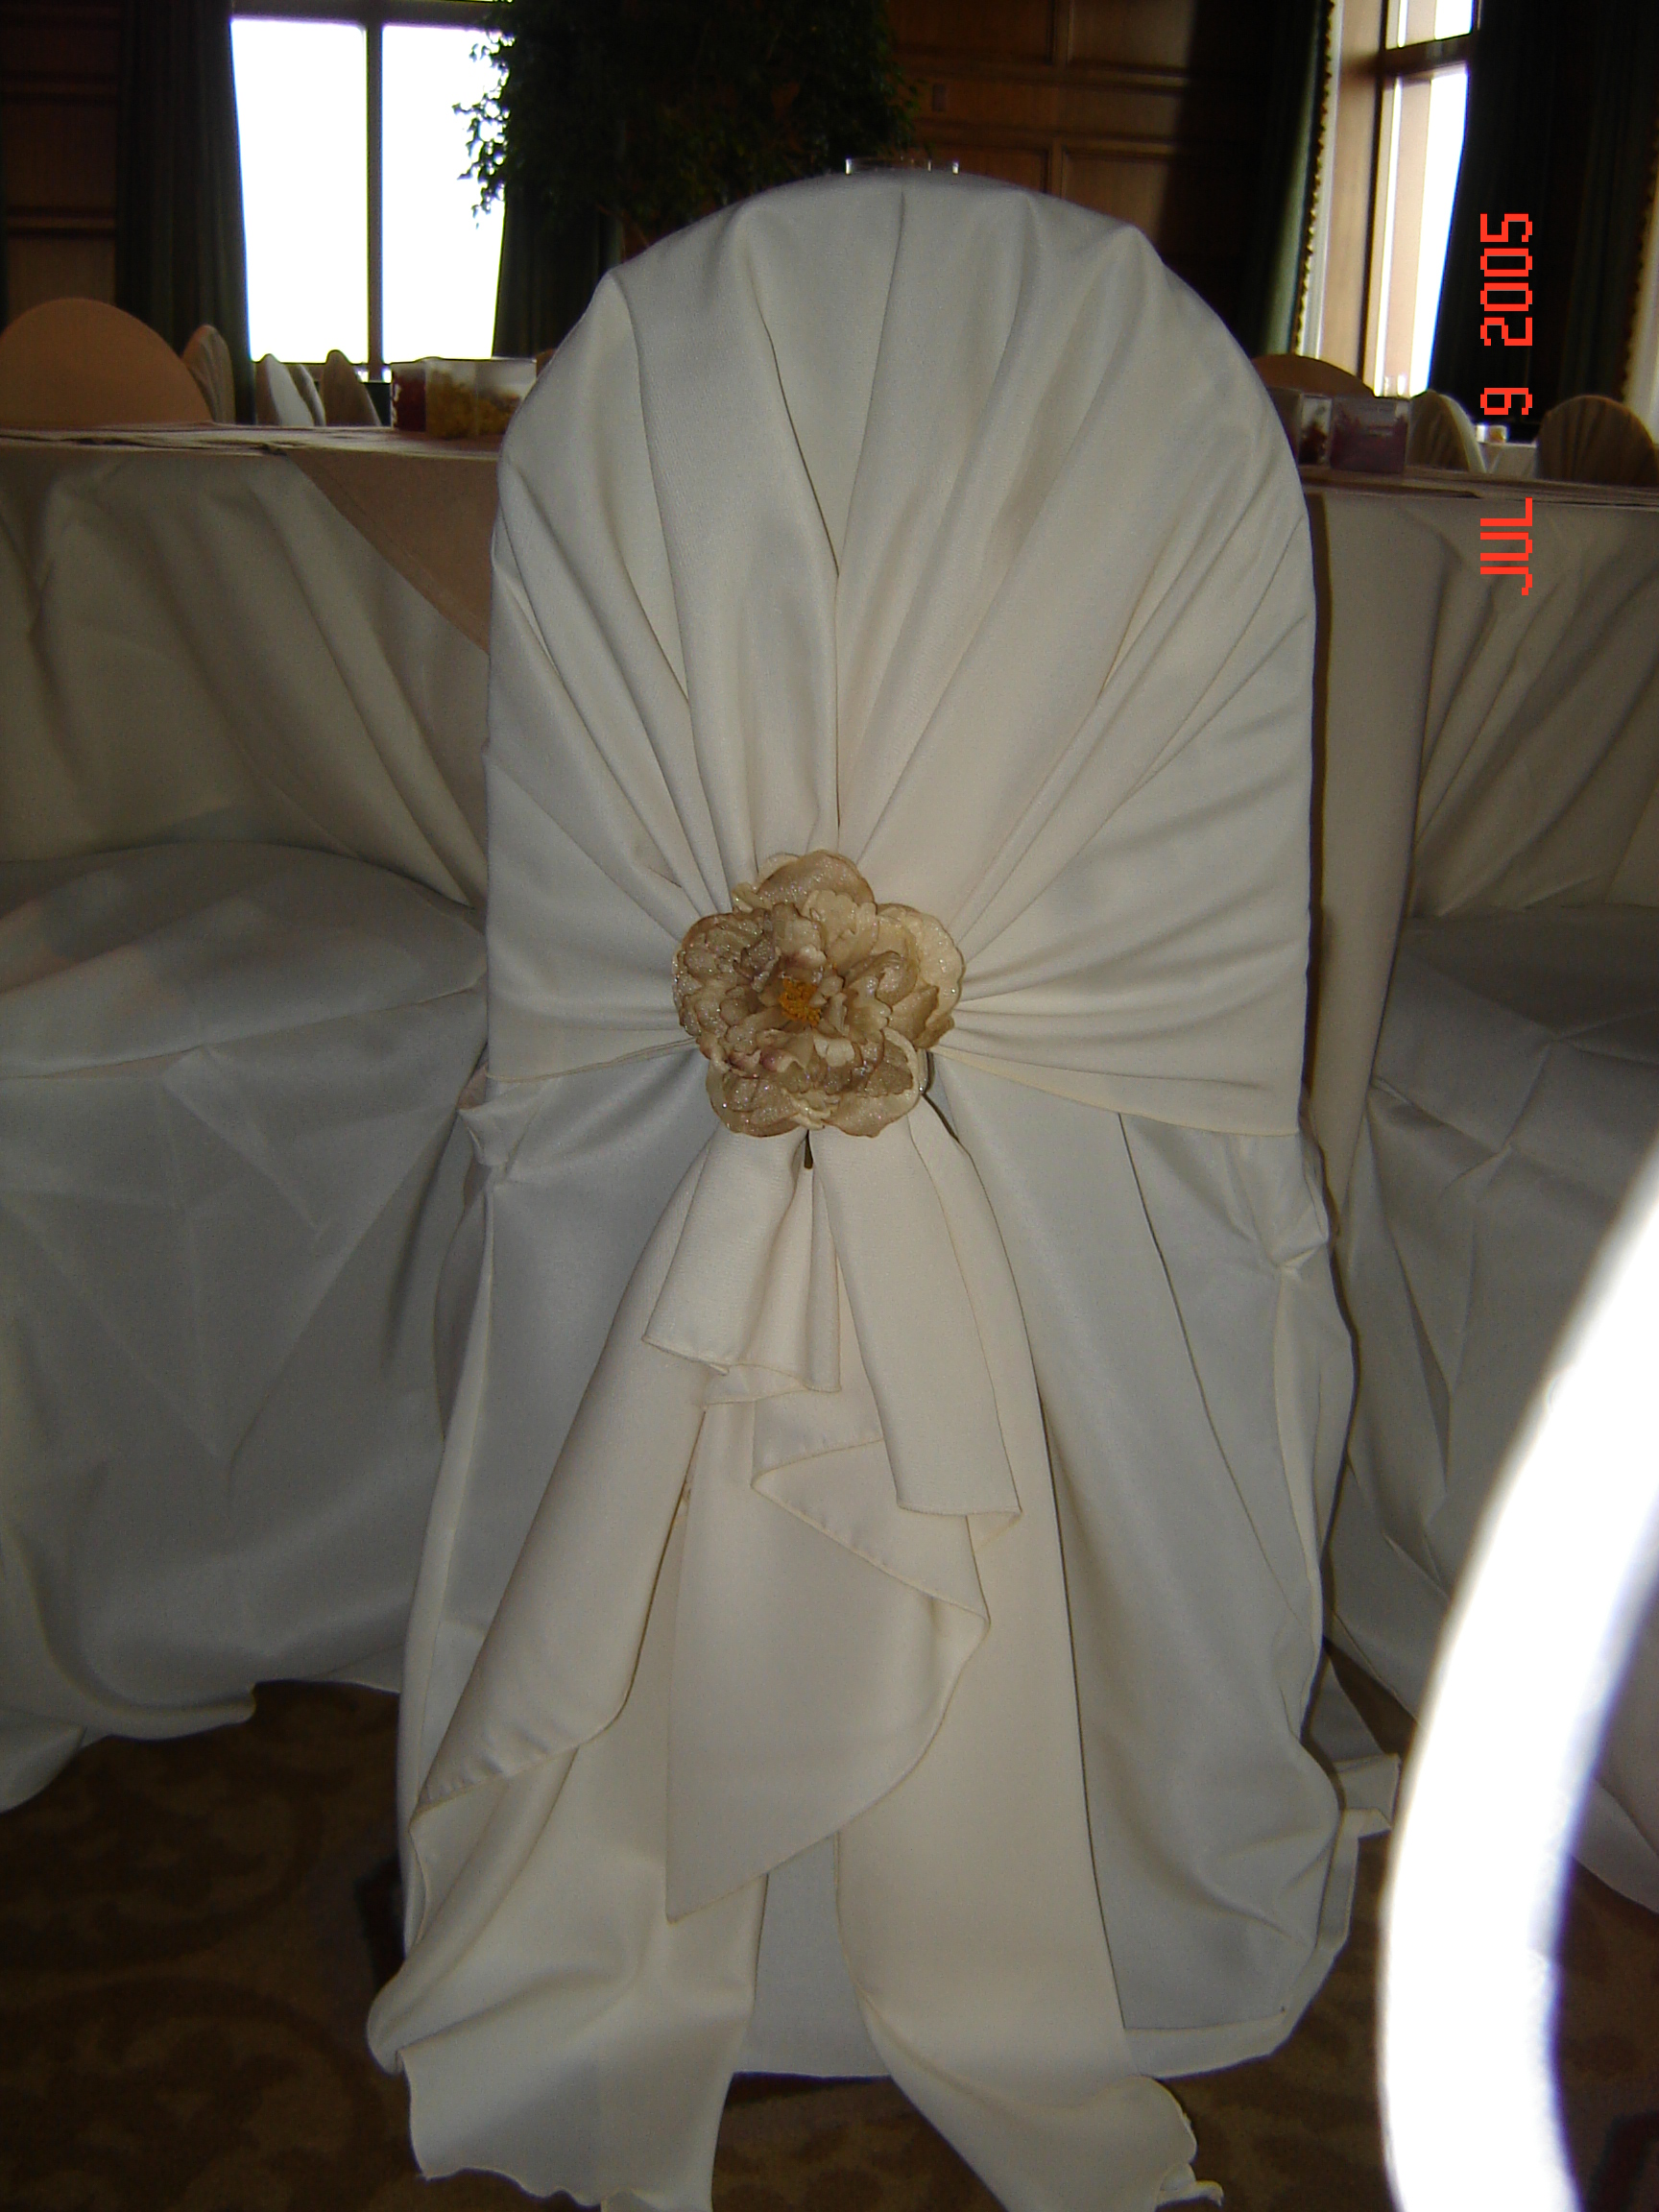 chair cover rentals dallas texas leather club chairs simply elegant weddings wedding